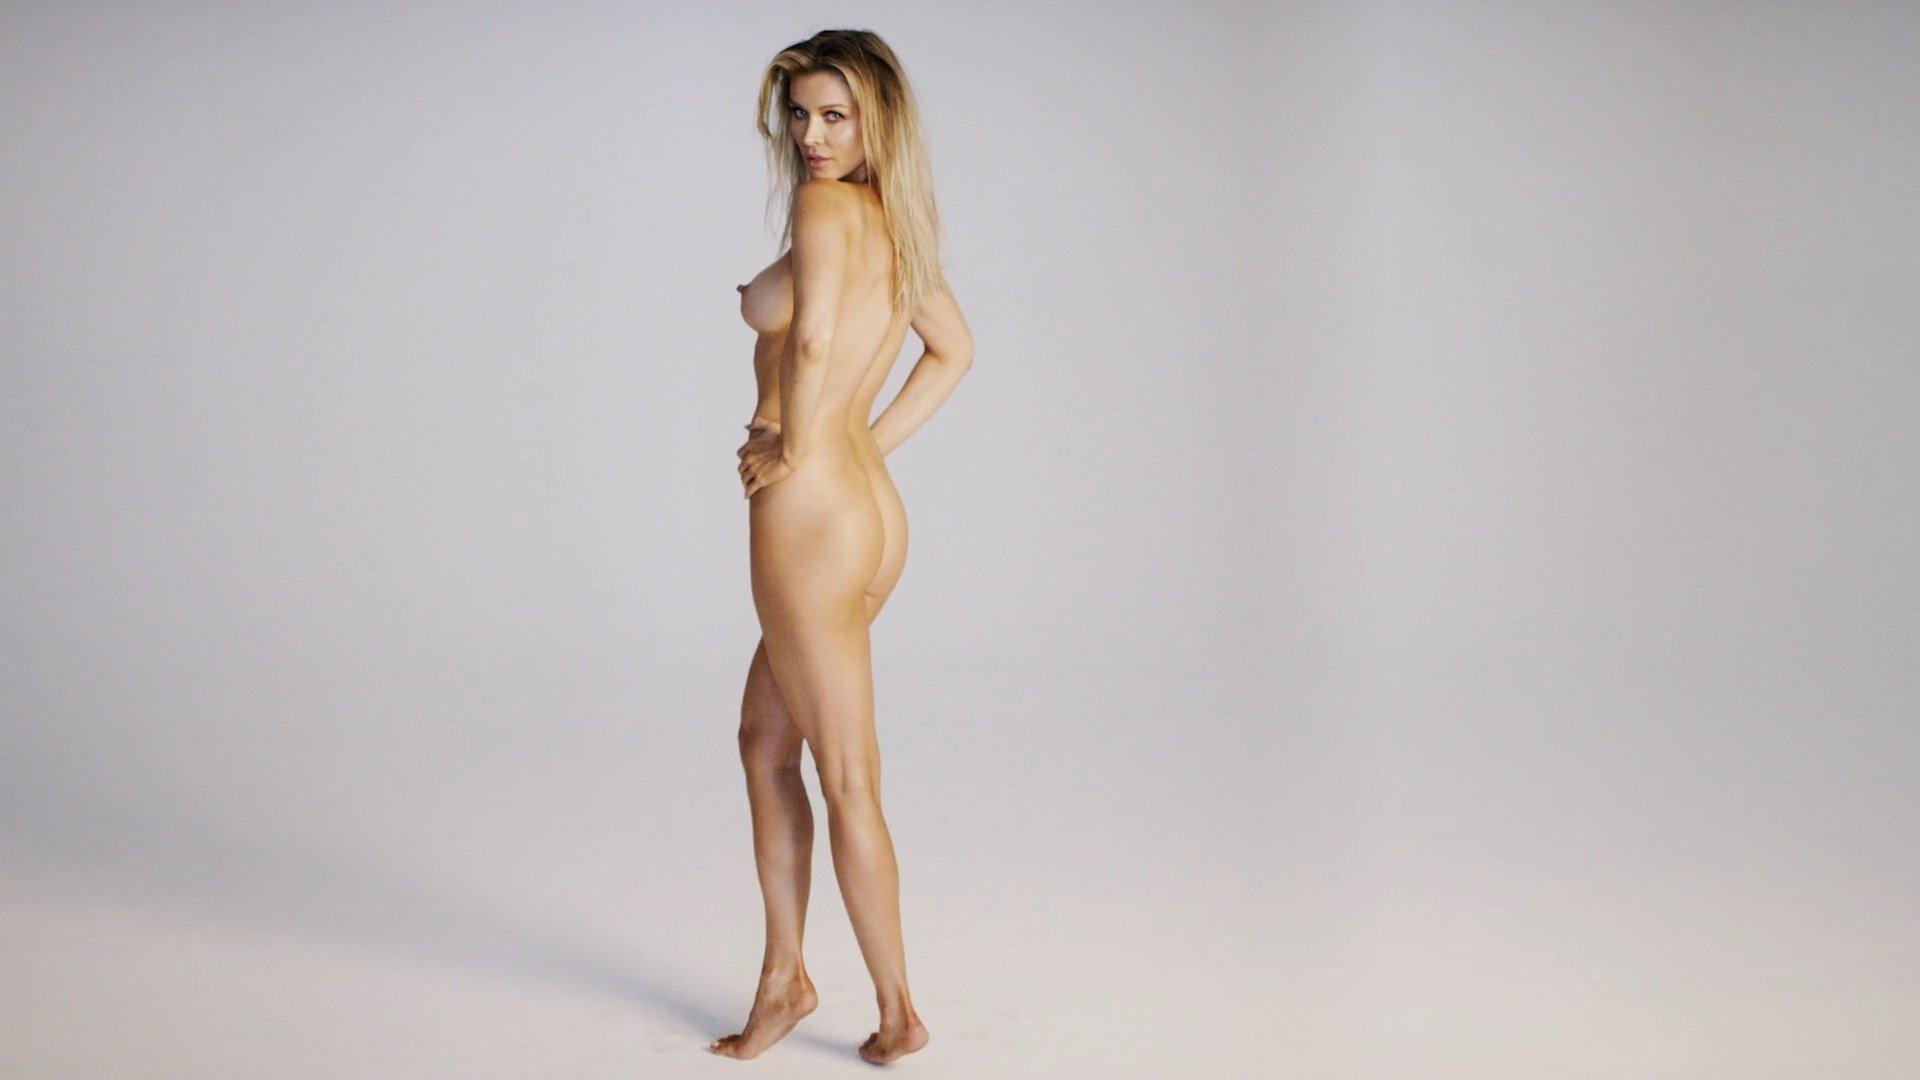 Joanna krupa pussy video — pic 10